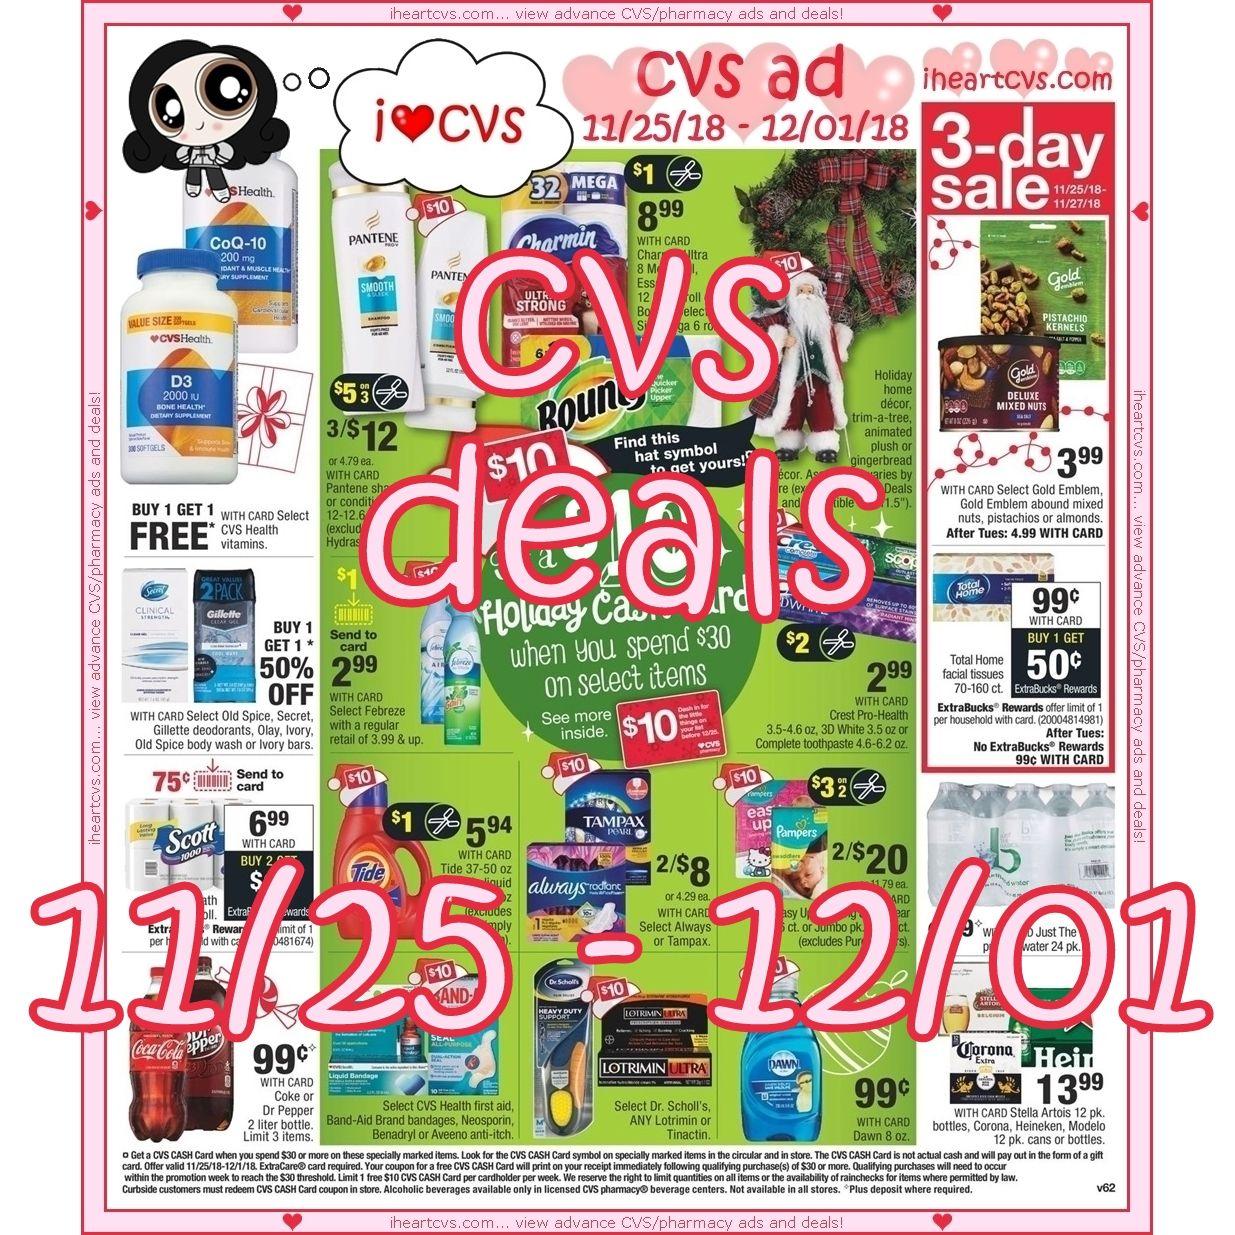 11 25 12 01 Cash Card Charmin Free Deals View advance cvs/pharmacy ads and deals. pinterest